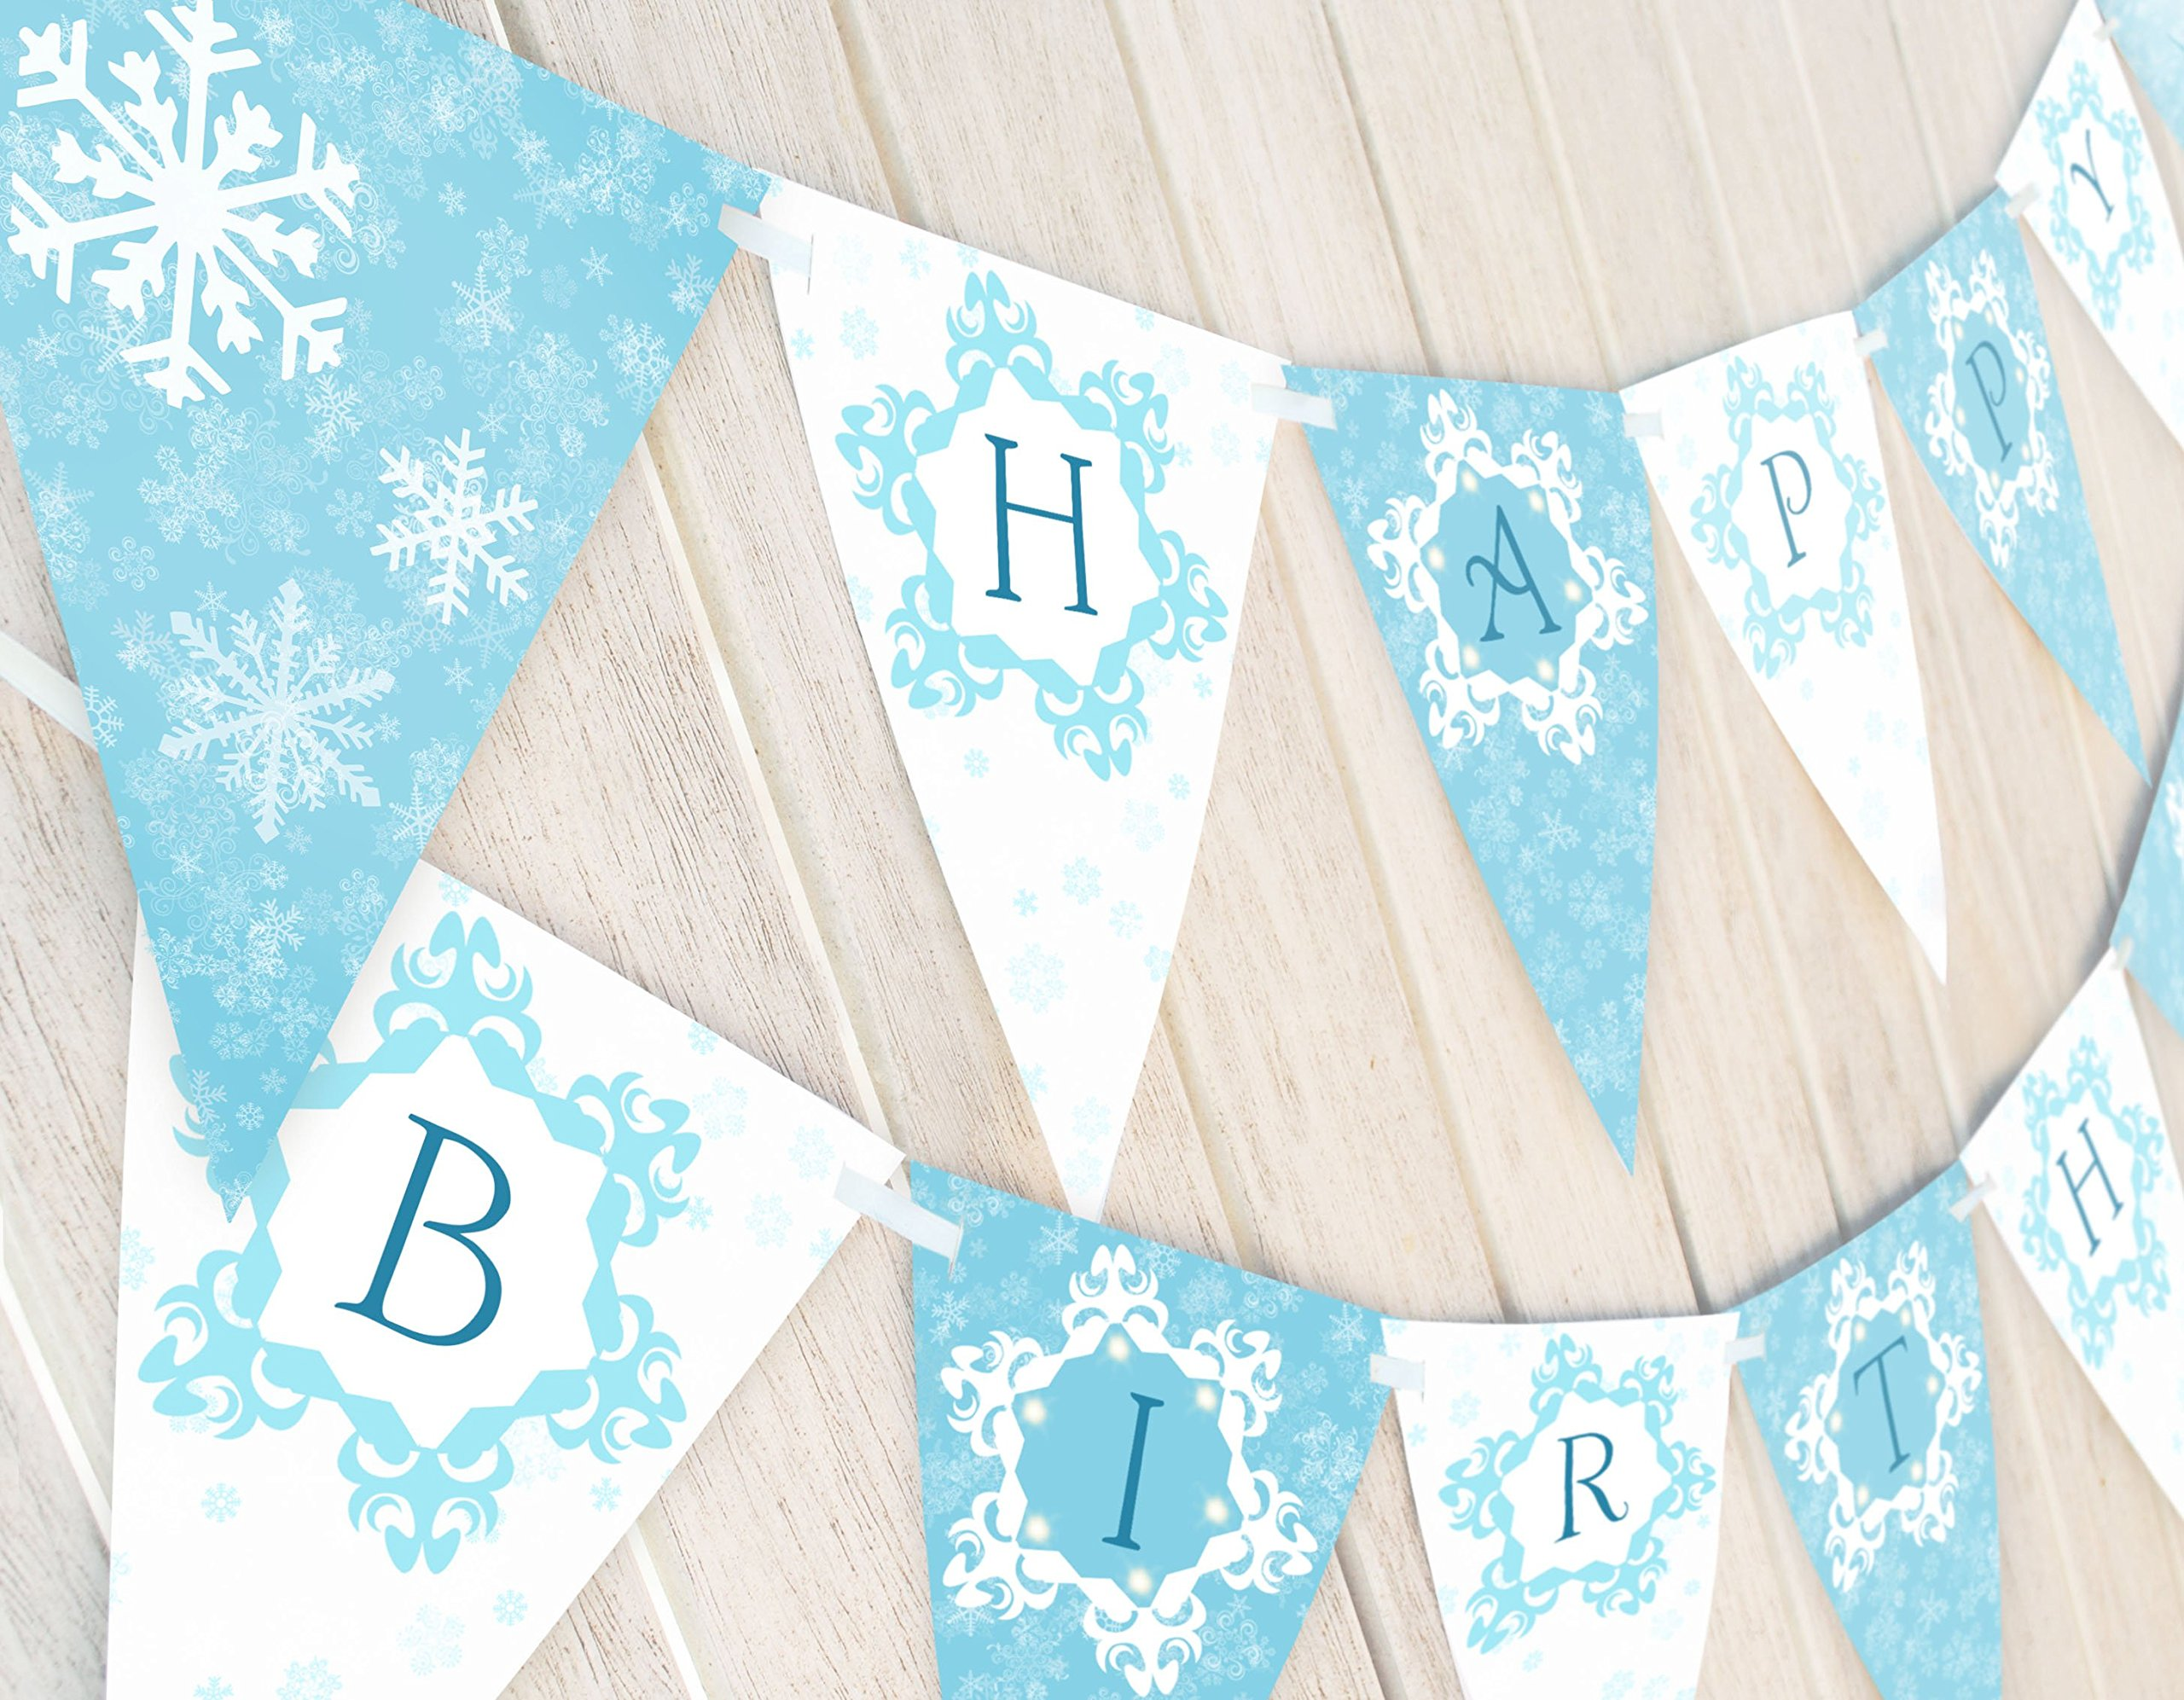 Snow Princess Birthday Banner - Winter Birthday Banner by POP parties by POP parties